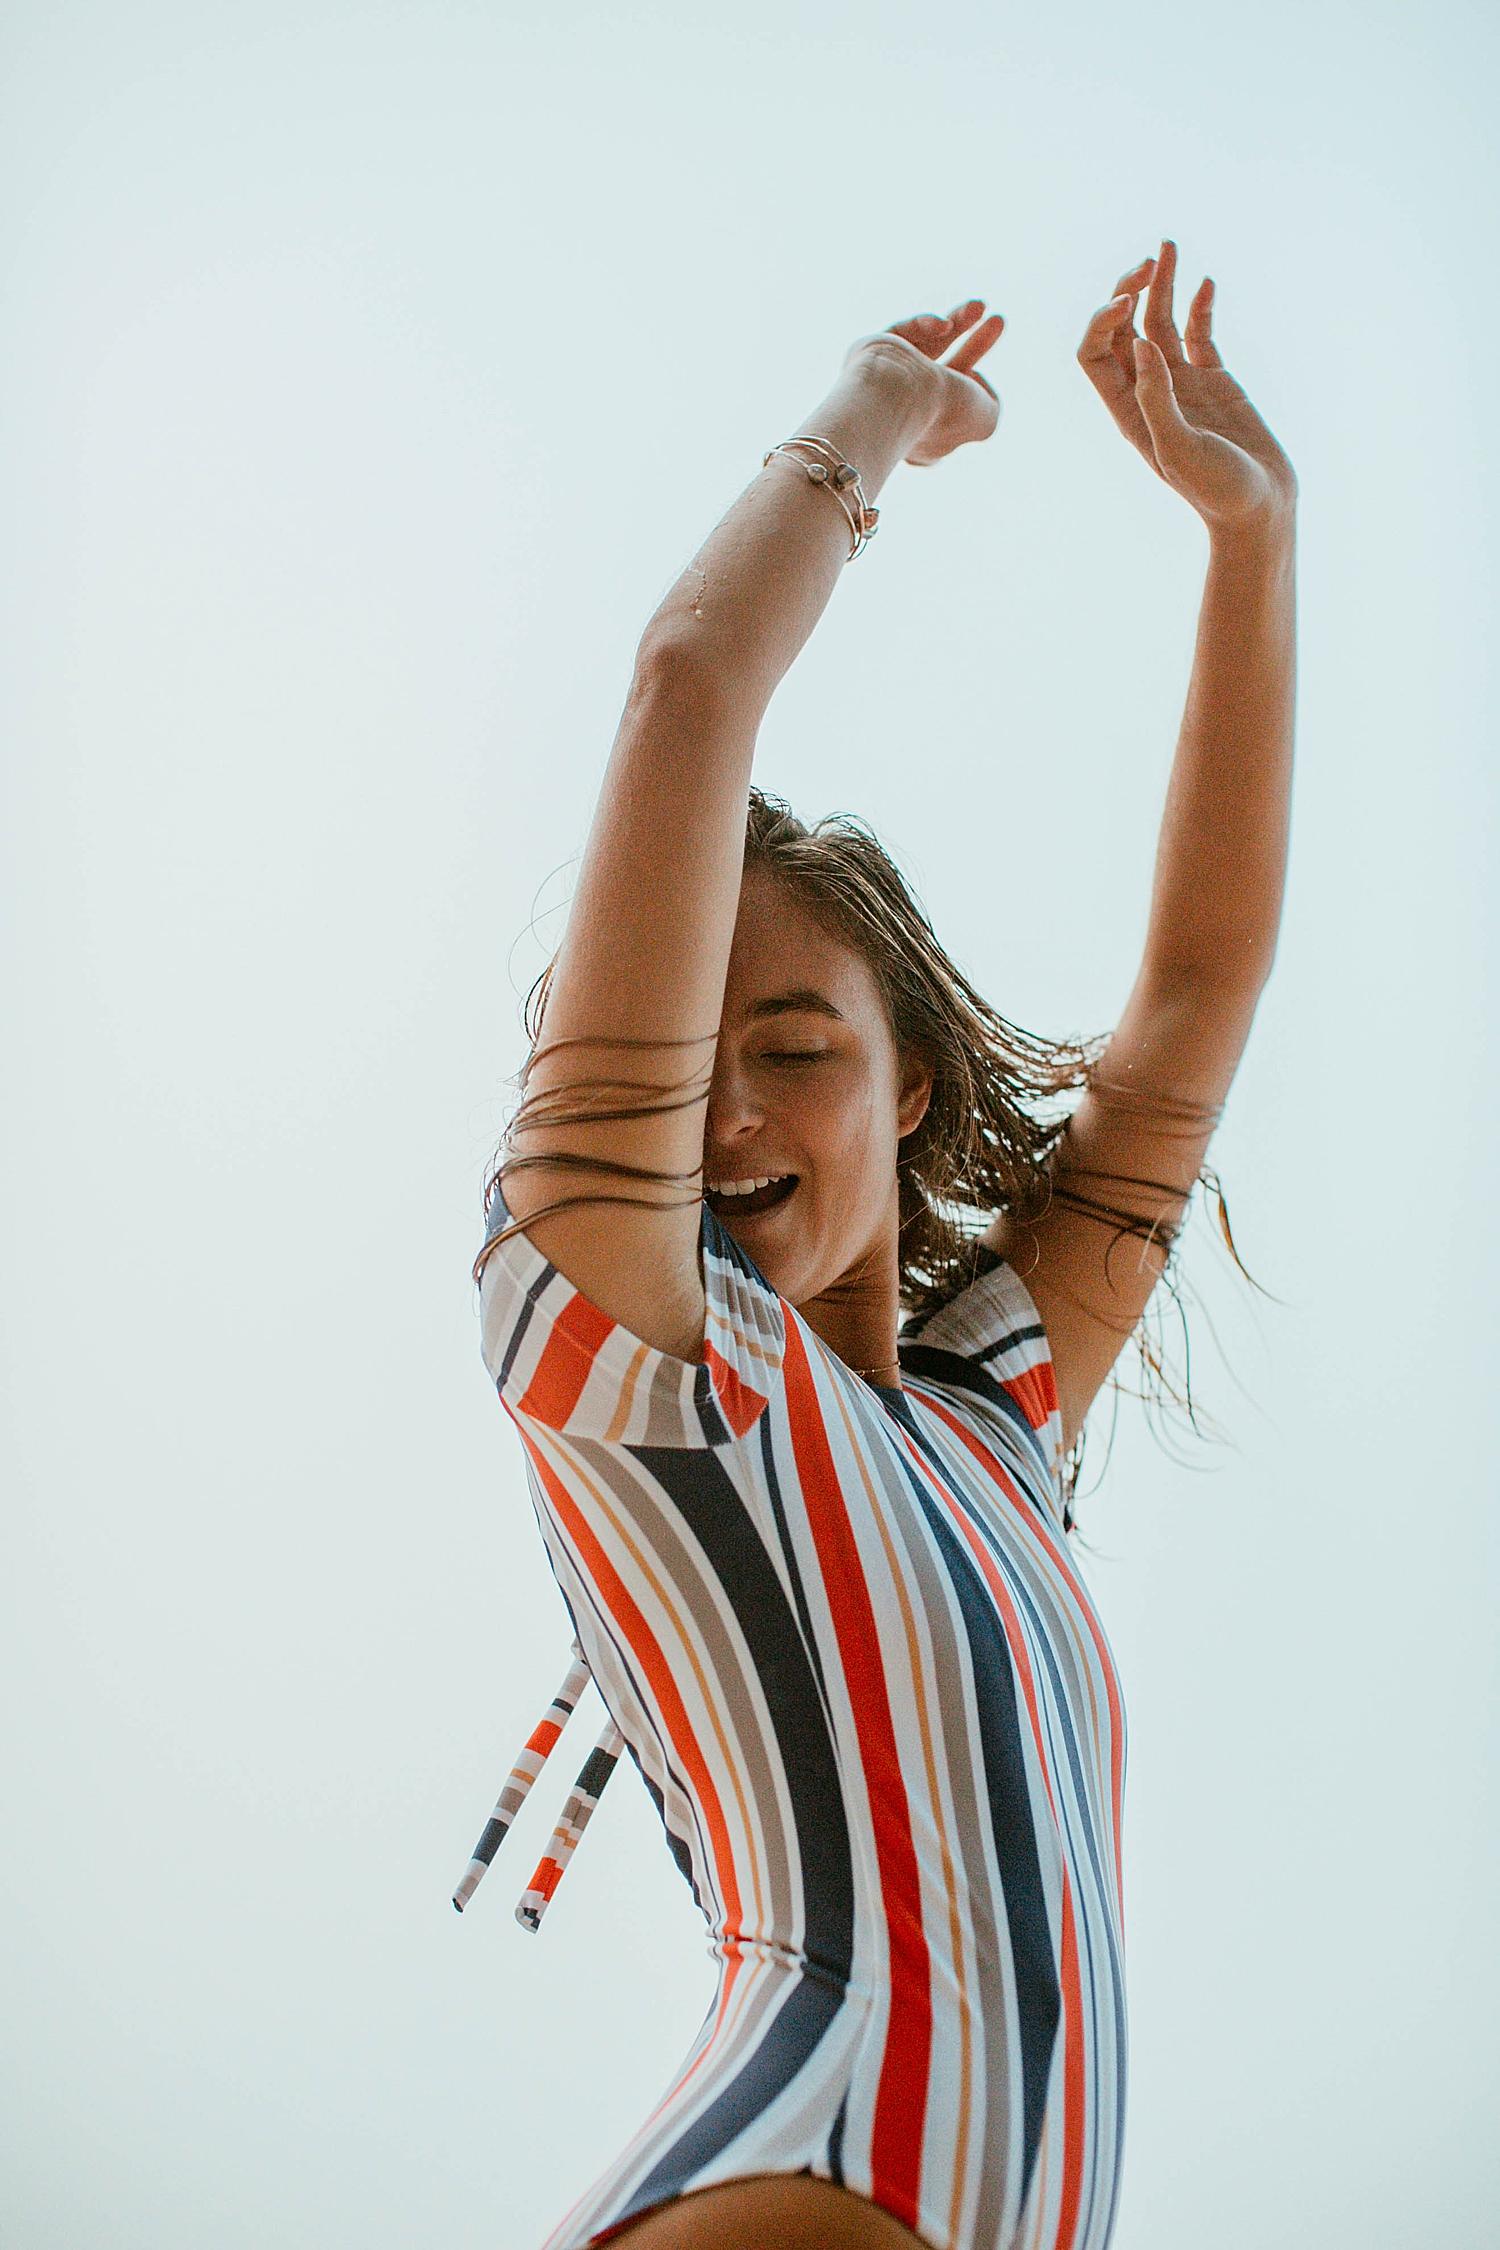 Travel & Lifestyle Fashion Photography with Benoa Swim, Cami and Jax, Bailey Nagy and Kiana Fores by Kelee Bovelle on North Shore Oahu Hawaii_0006.jpg